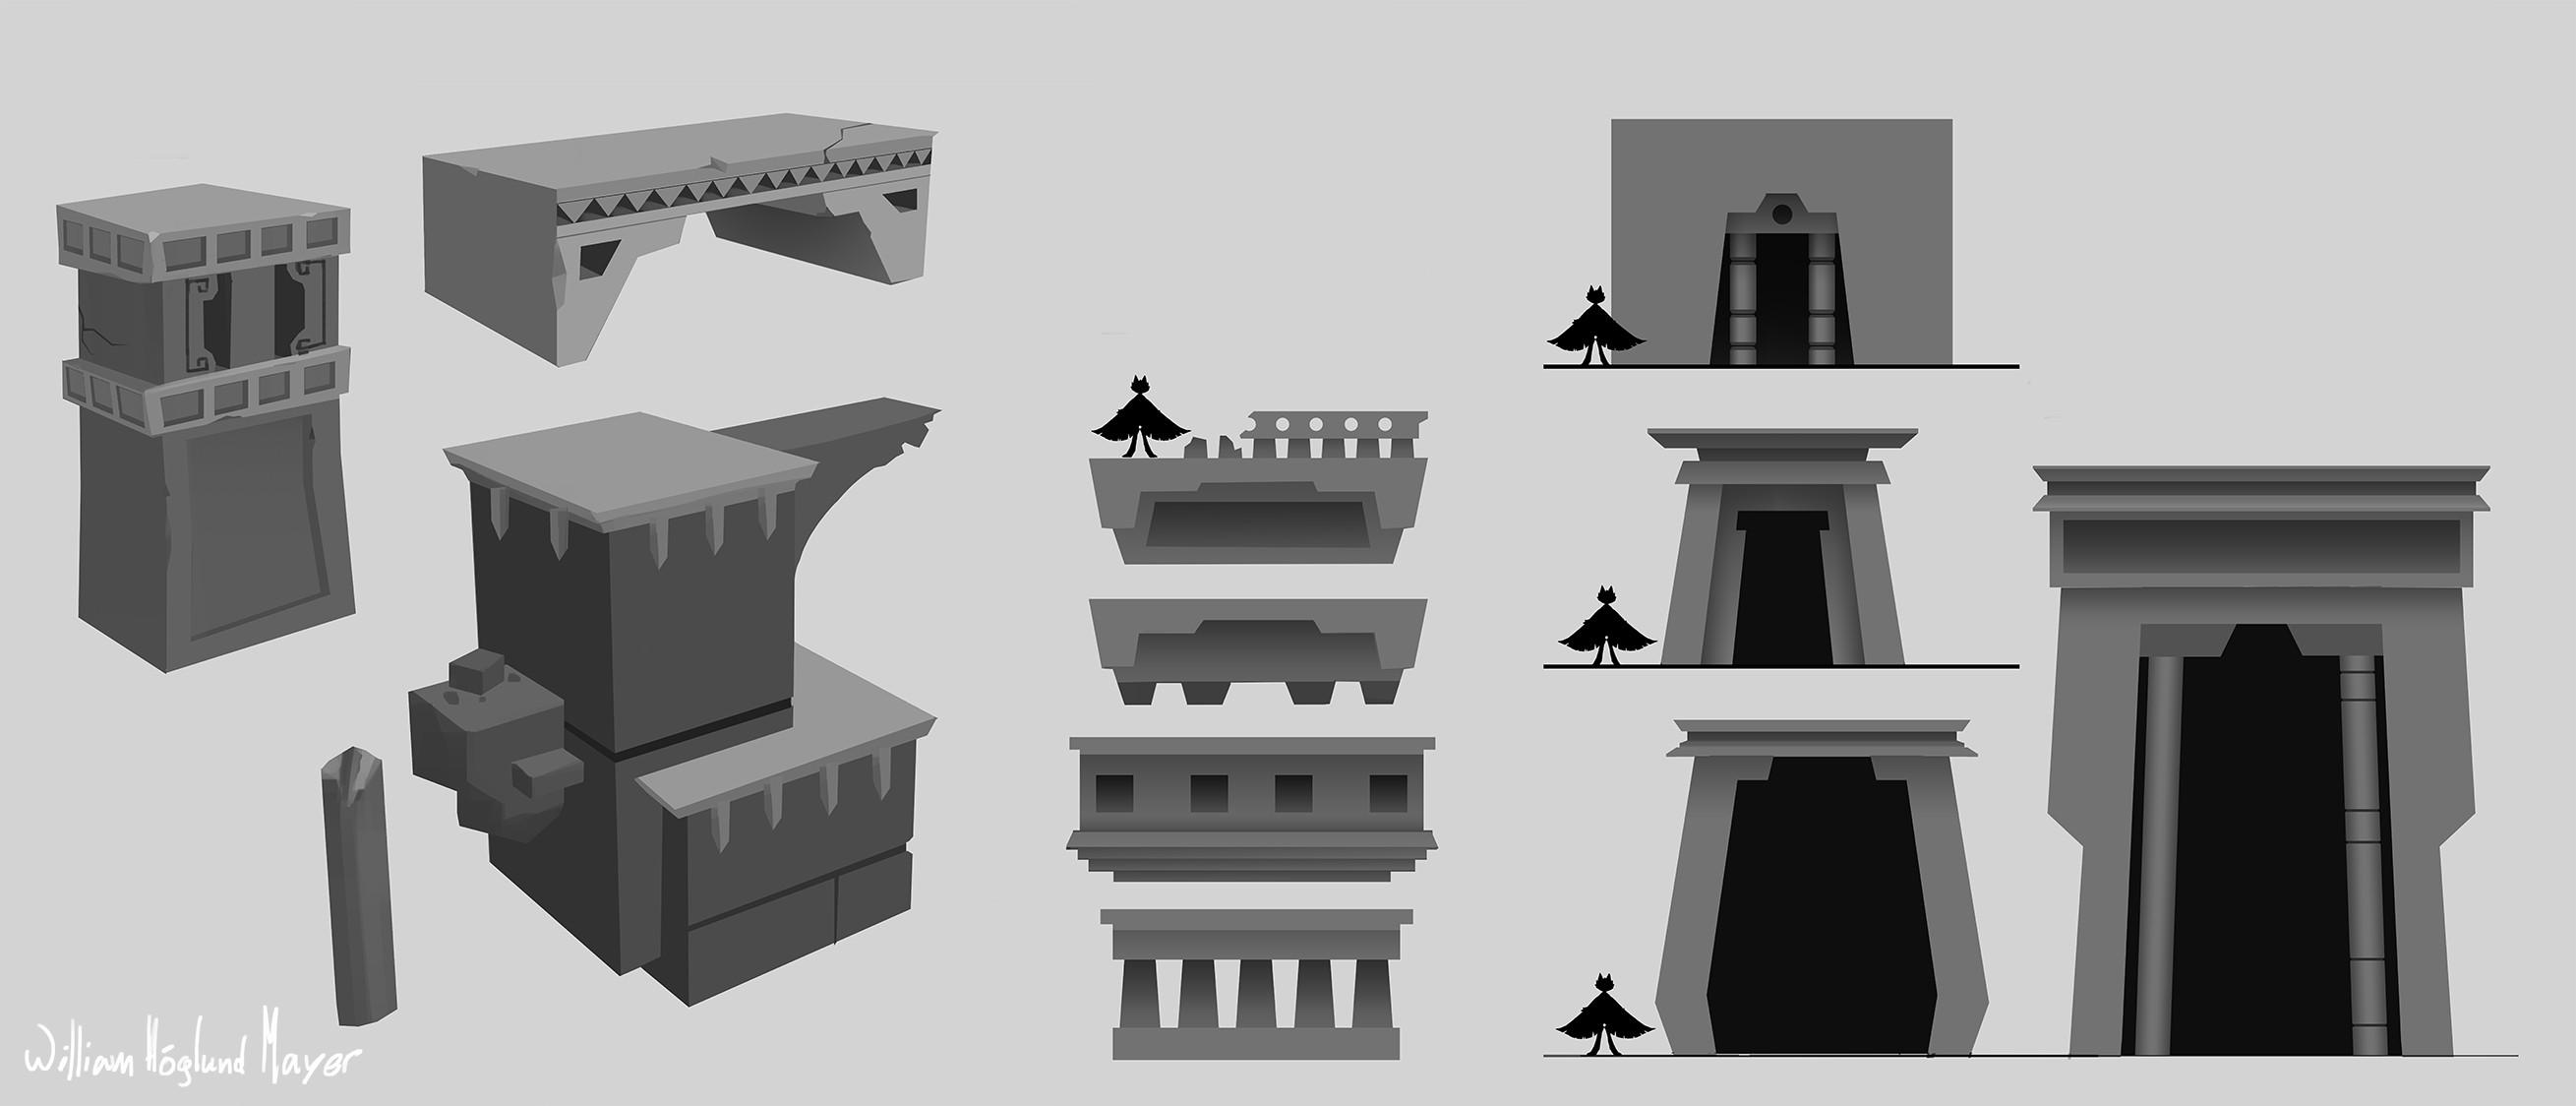 Concepts of ruins.